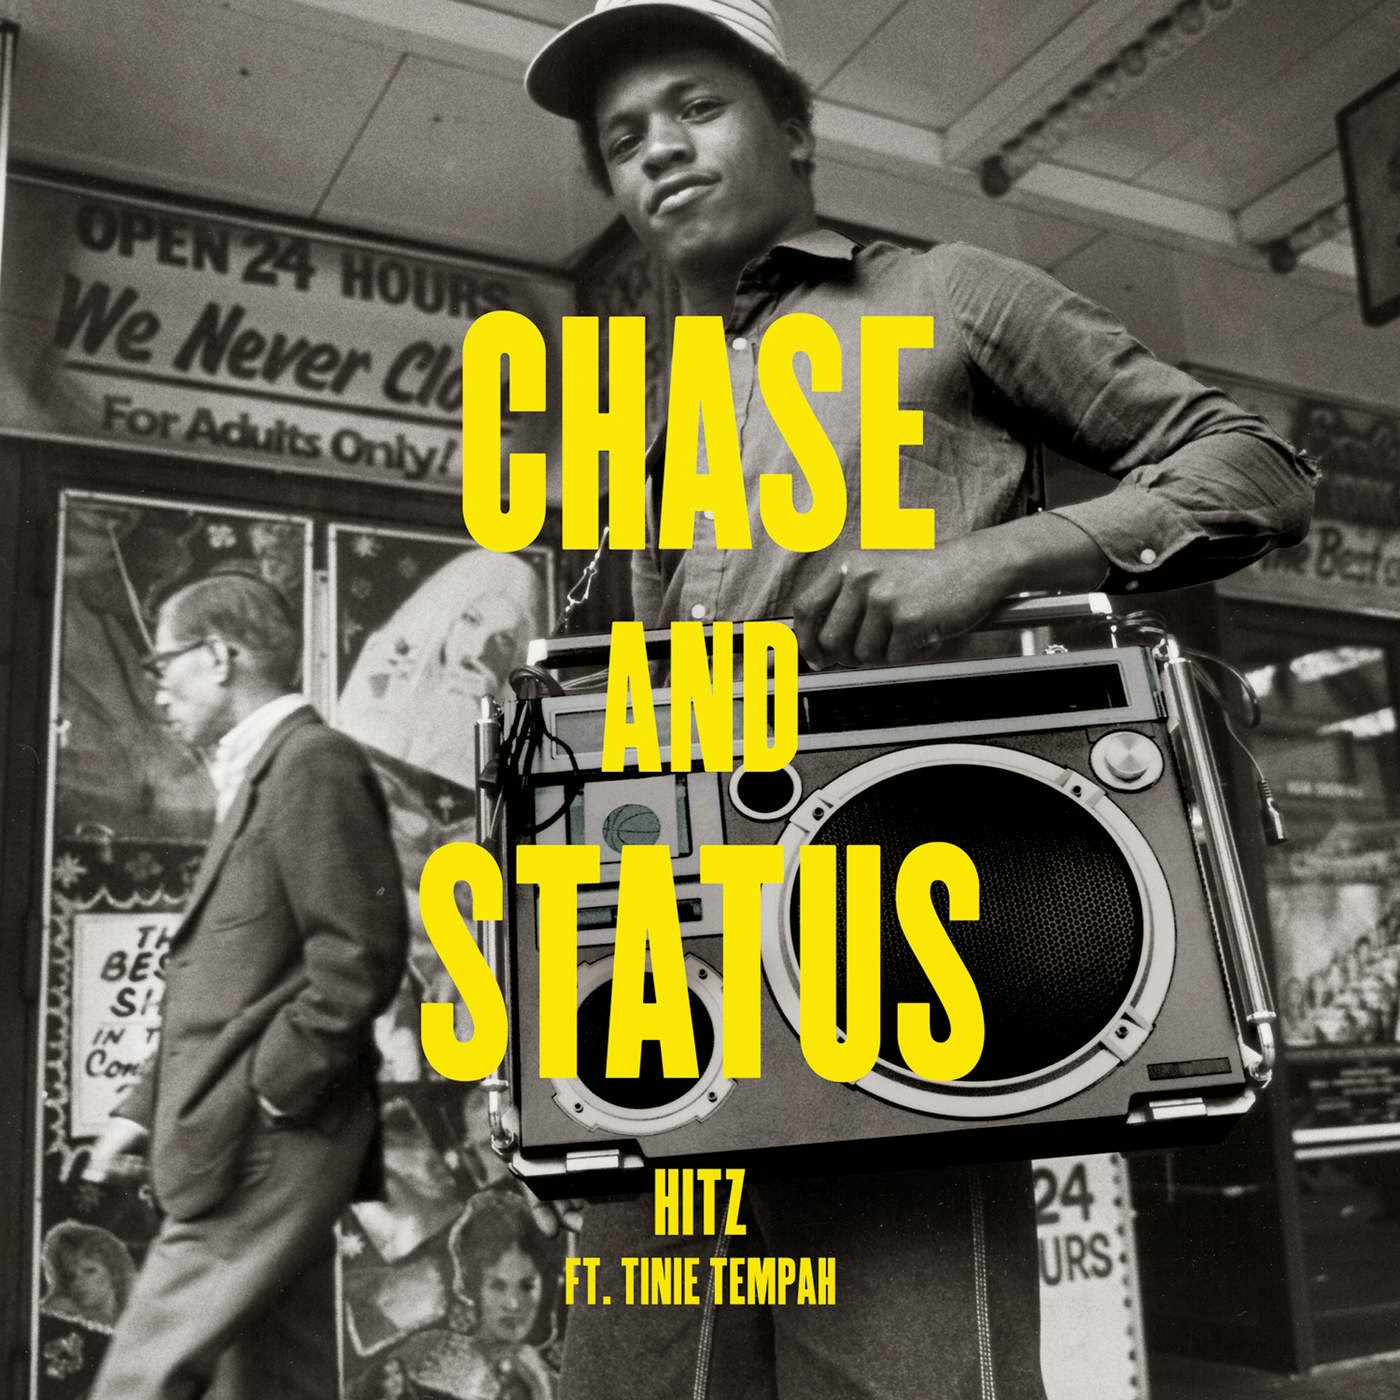 Chase & Status - Hitz (feat. Tinie Tempah) - Single Cover